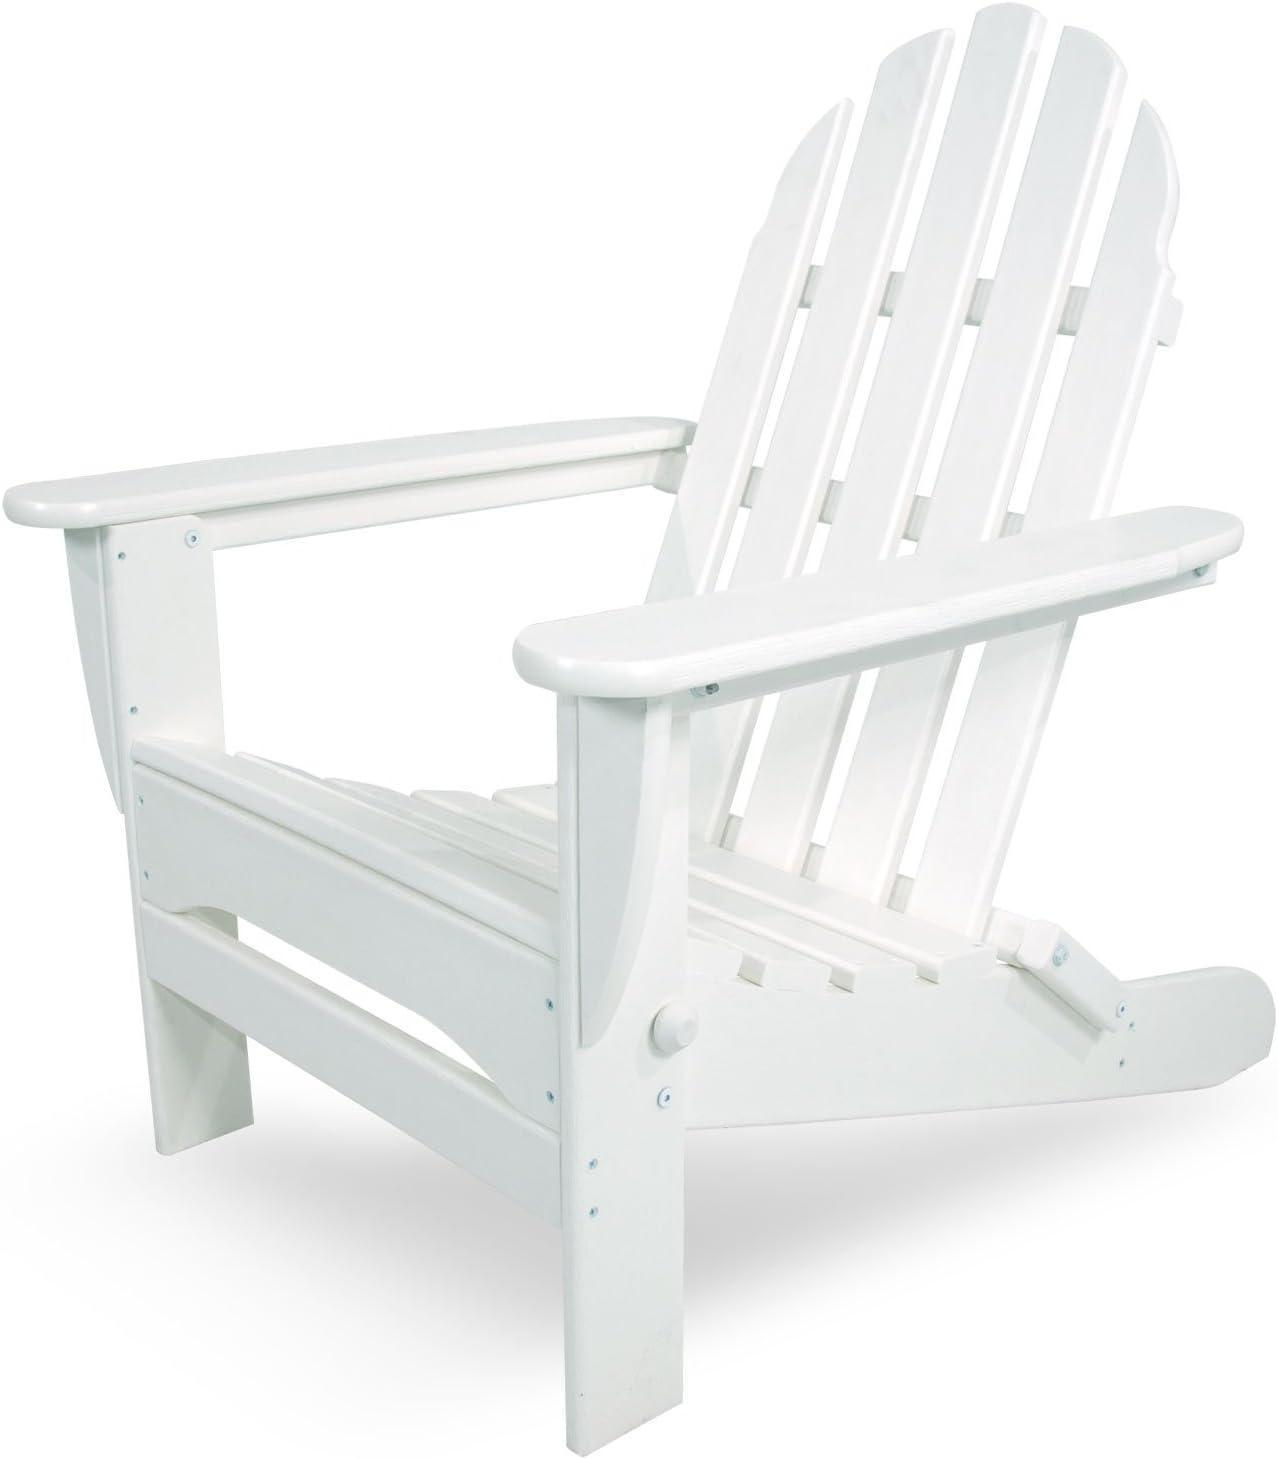 "POLYWOOD AD5030WH Classic Folding Adirondack Chair, 35.00"" x 29"" x 35.00"", White"